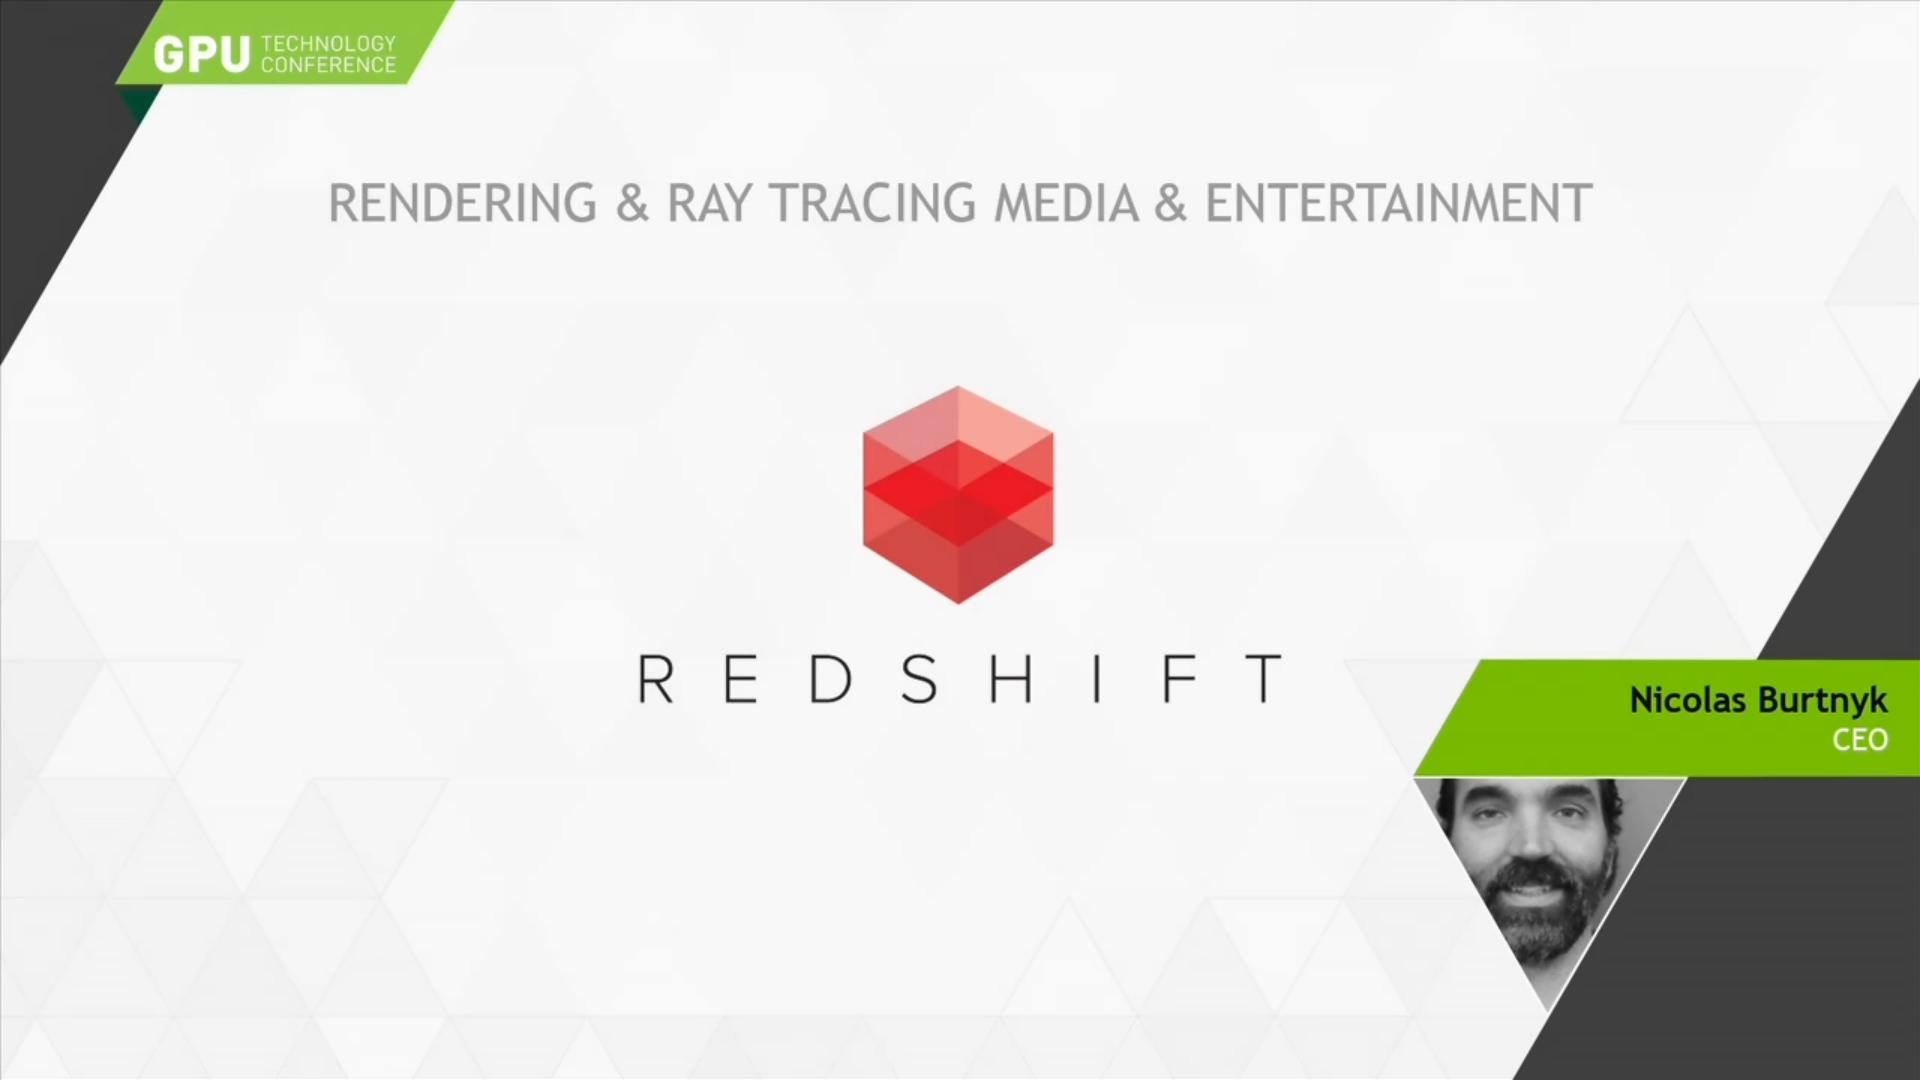 Redshift GPU渲染器汉化版  Redshift C4D/Houdini/Maya/3DS MAX插件版本 V2.5.32 Win